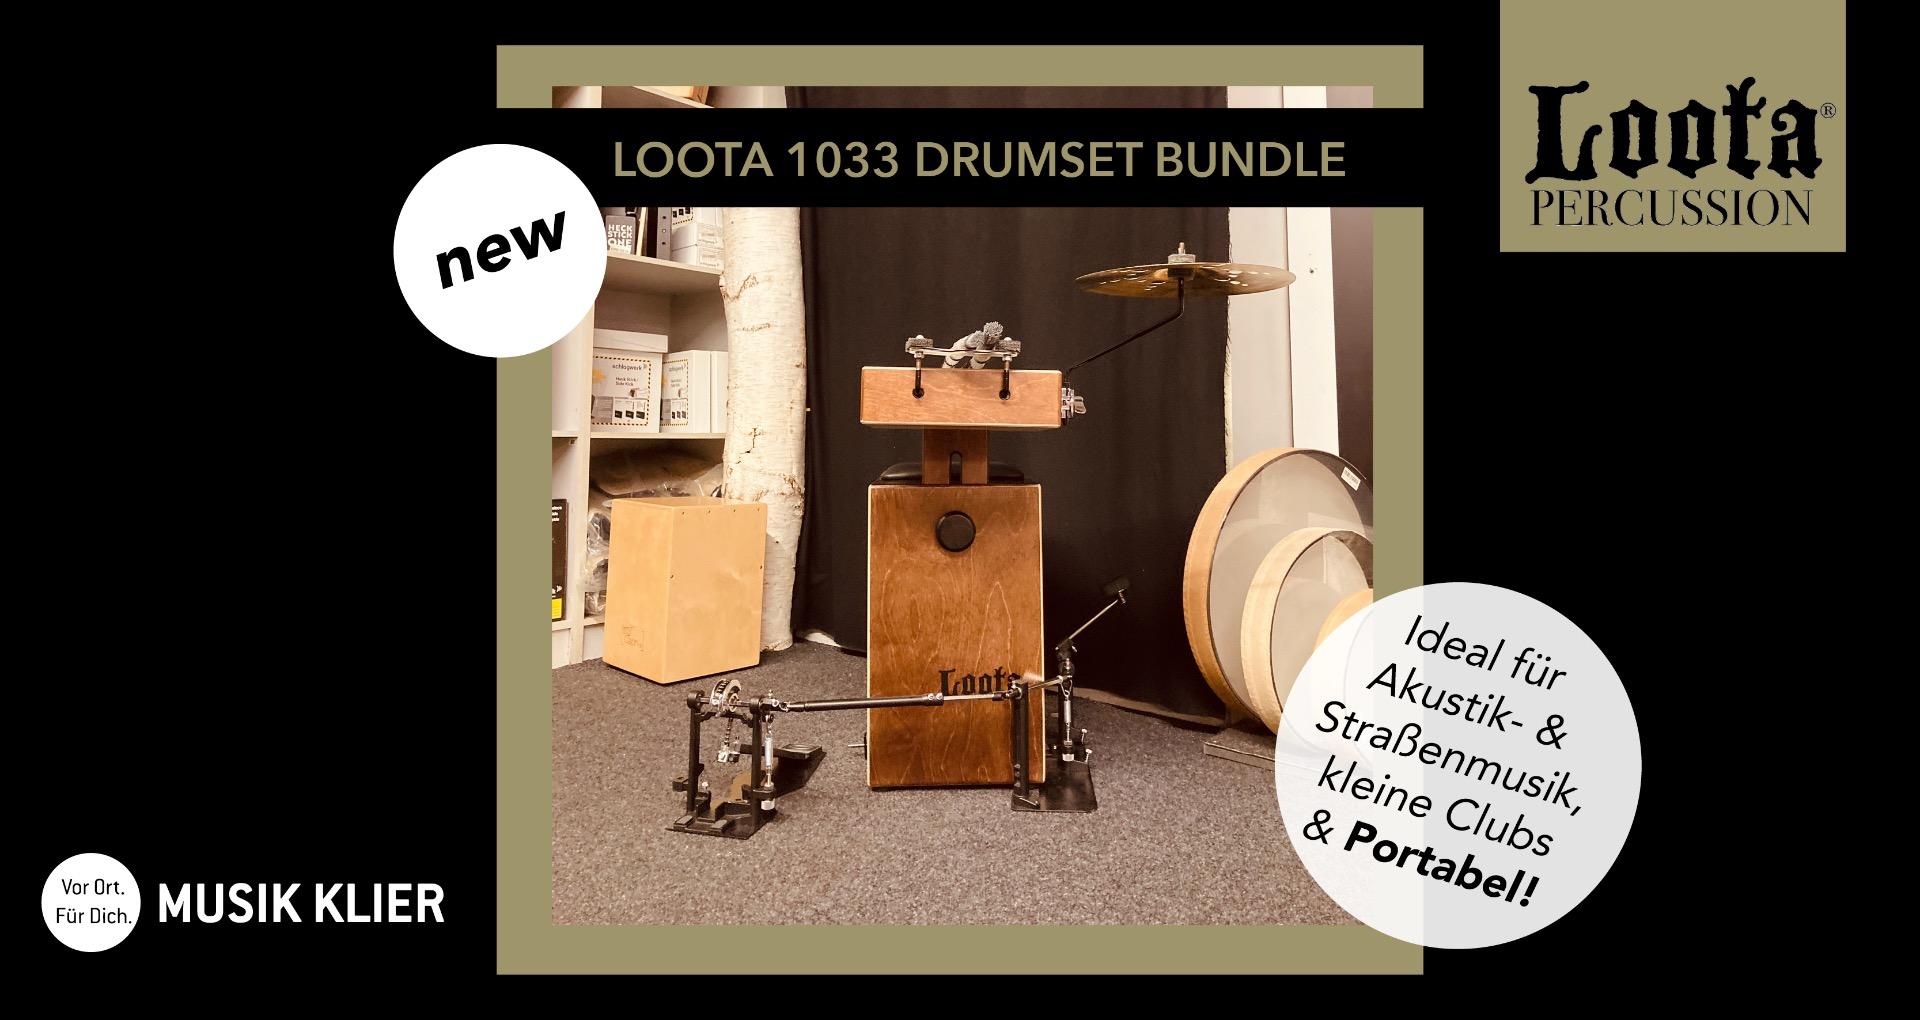 Loota Percussion 1033 Drumset Bundle